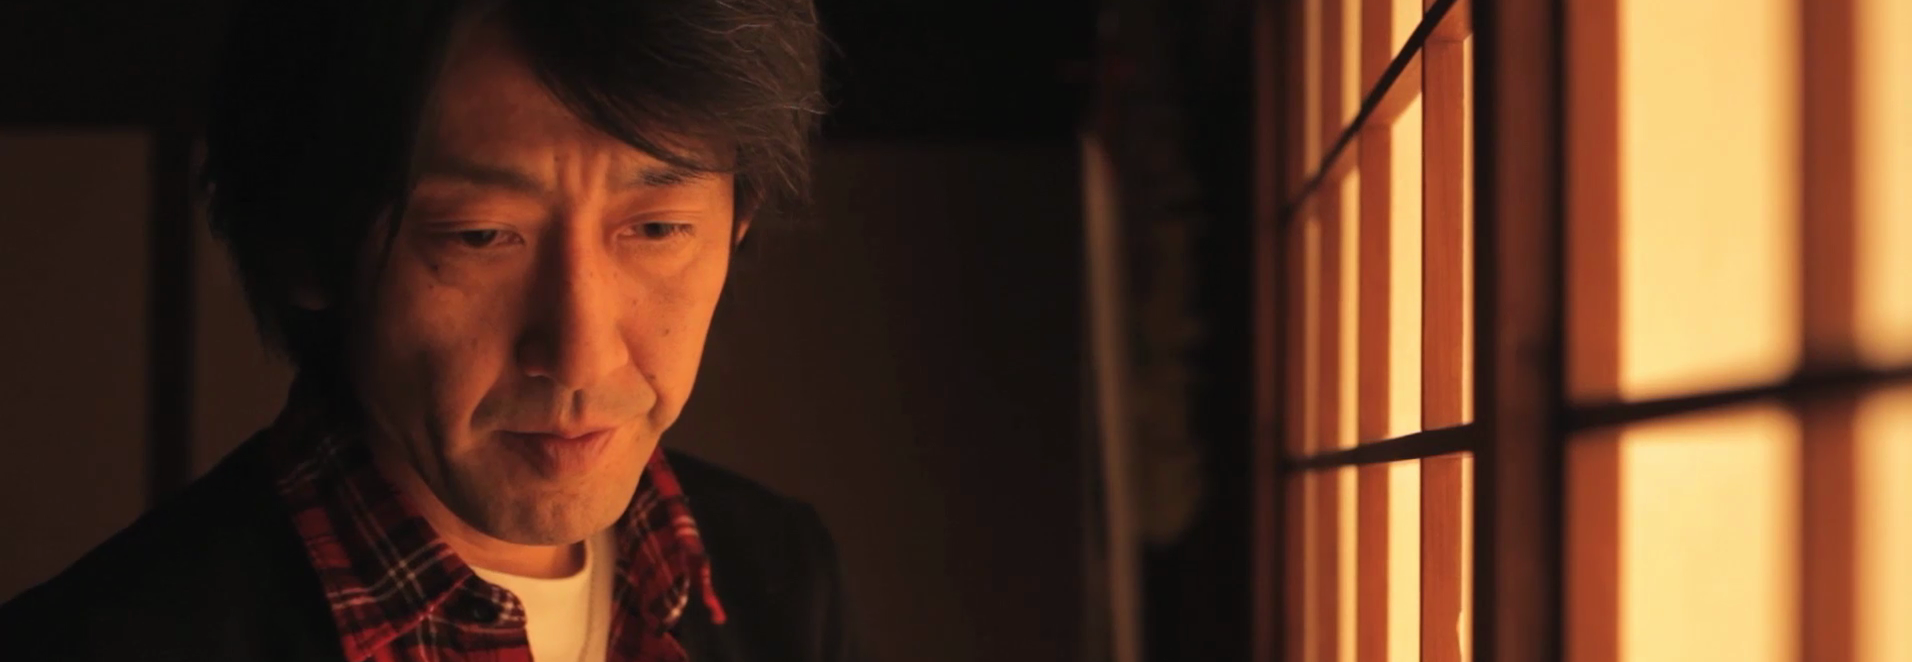 Mo Ikkai  | Drama | 10 minutes | Directed by Atsuko Hirayanagi, edited by Eric Elofson  View full film here: https://www.viki.com/videos/1041866v-mou-ikkai